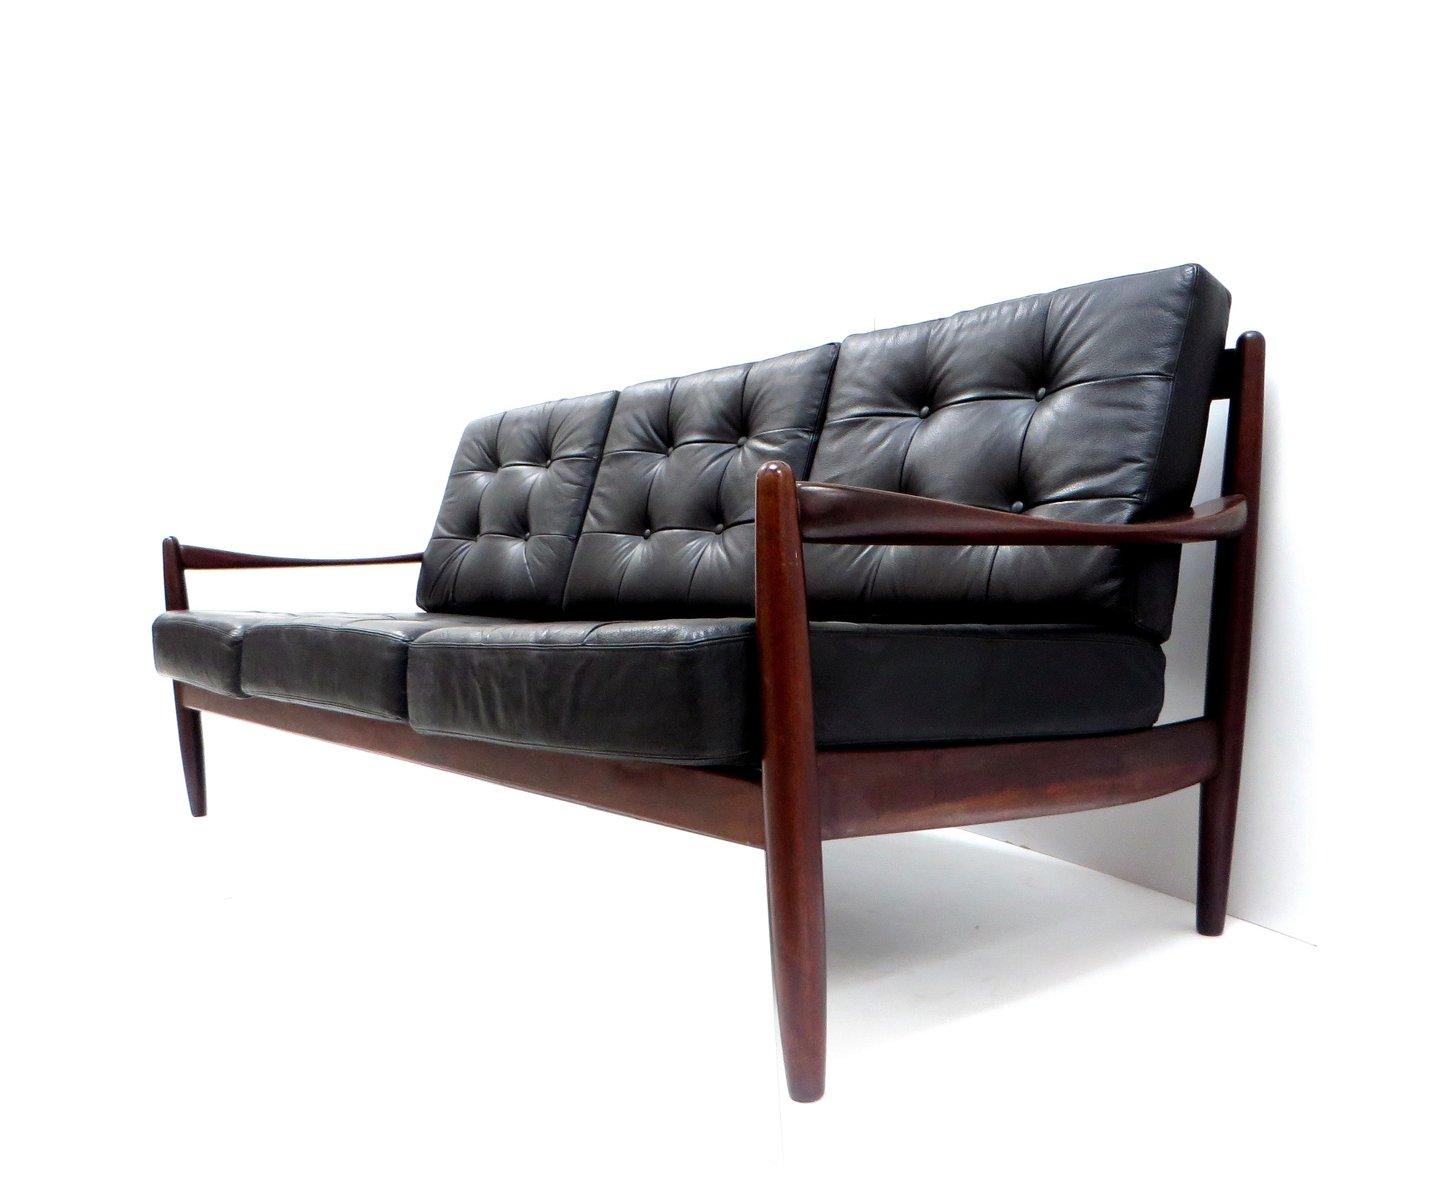 canap 3 places vintage en cuir danemark en vente sur pamono. Black Bedroom Furniture Sets. Home Design Ideas